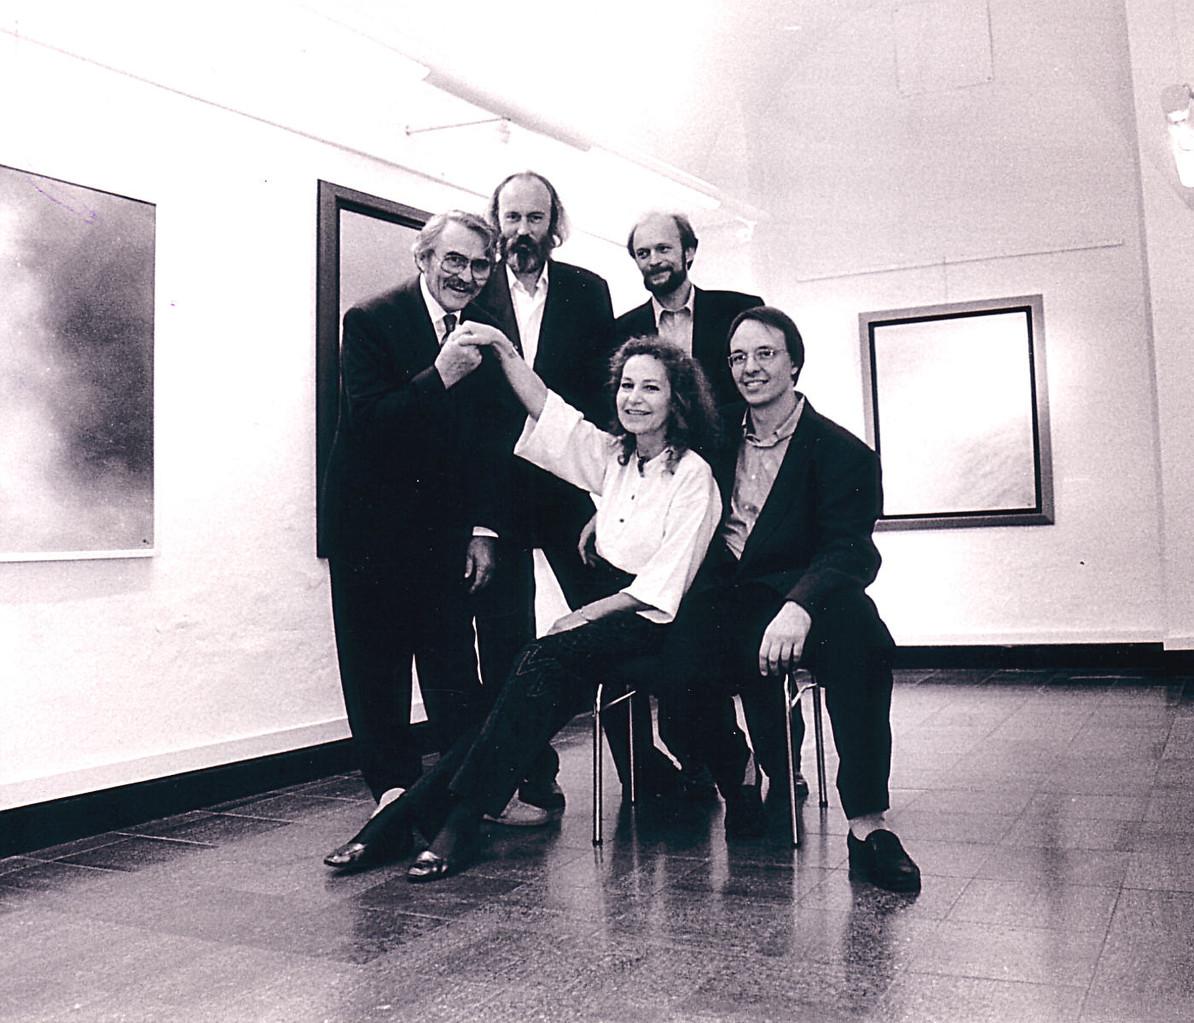 v.l. Horst Hausotte, Ralph Herrmann, Arno Wendland, Martin Buntrock, Ulla Höpken